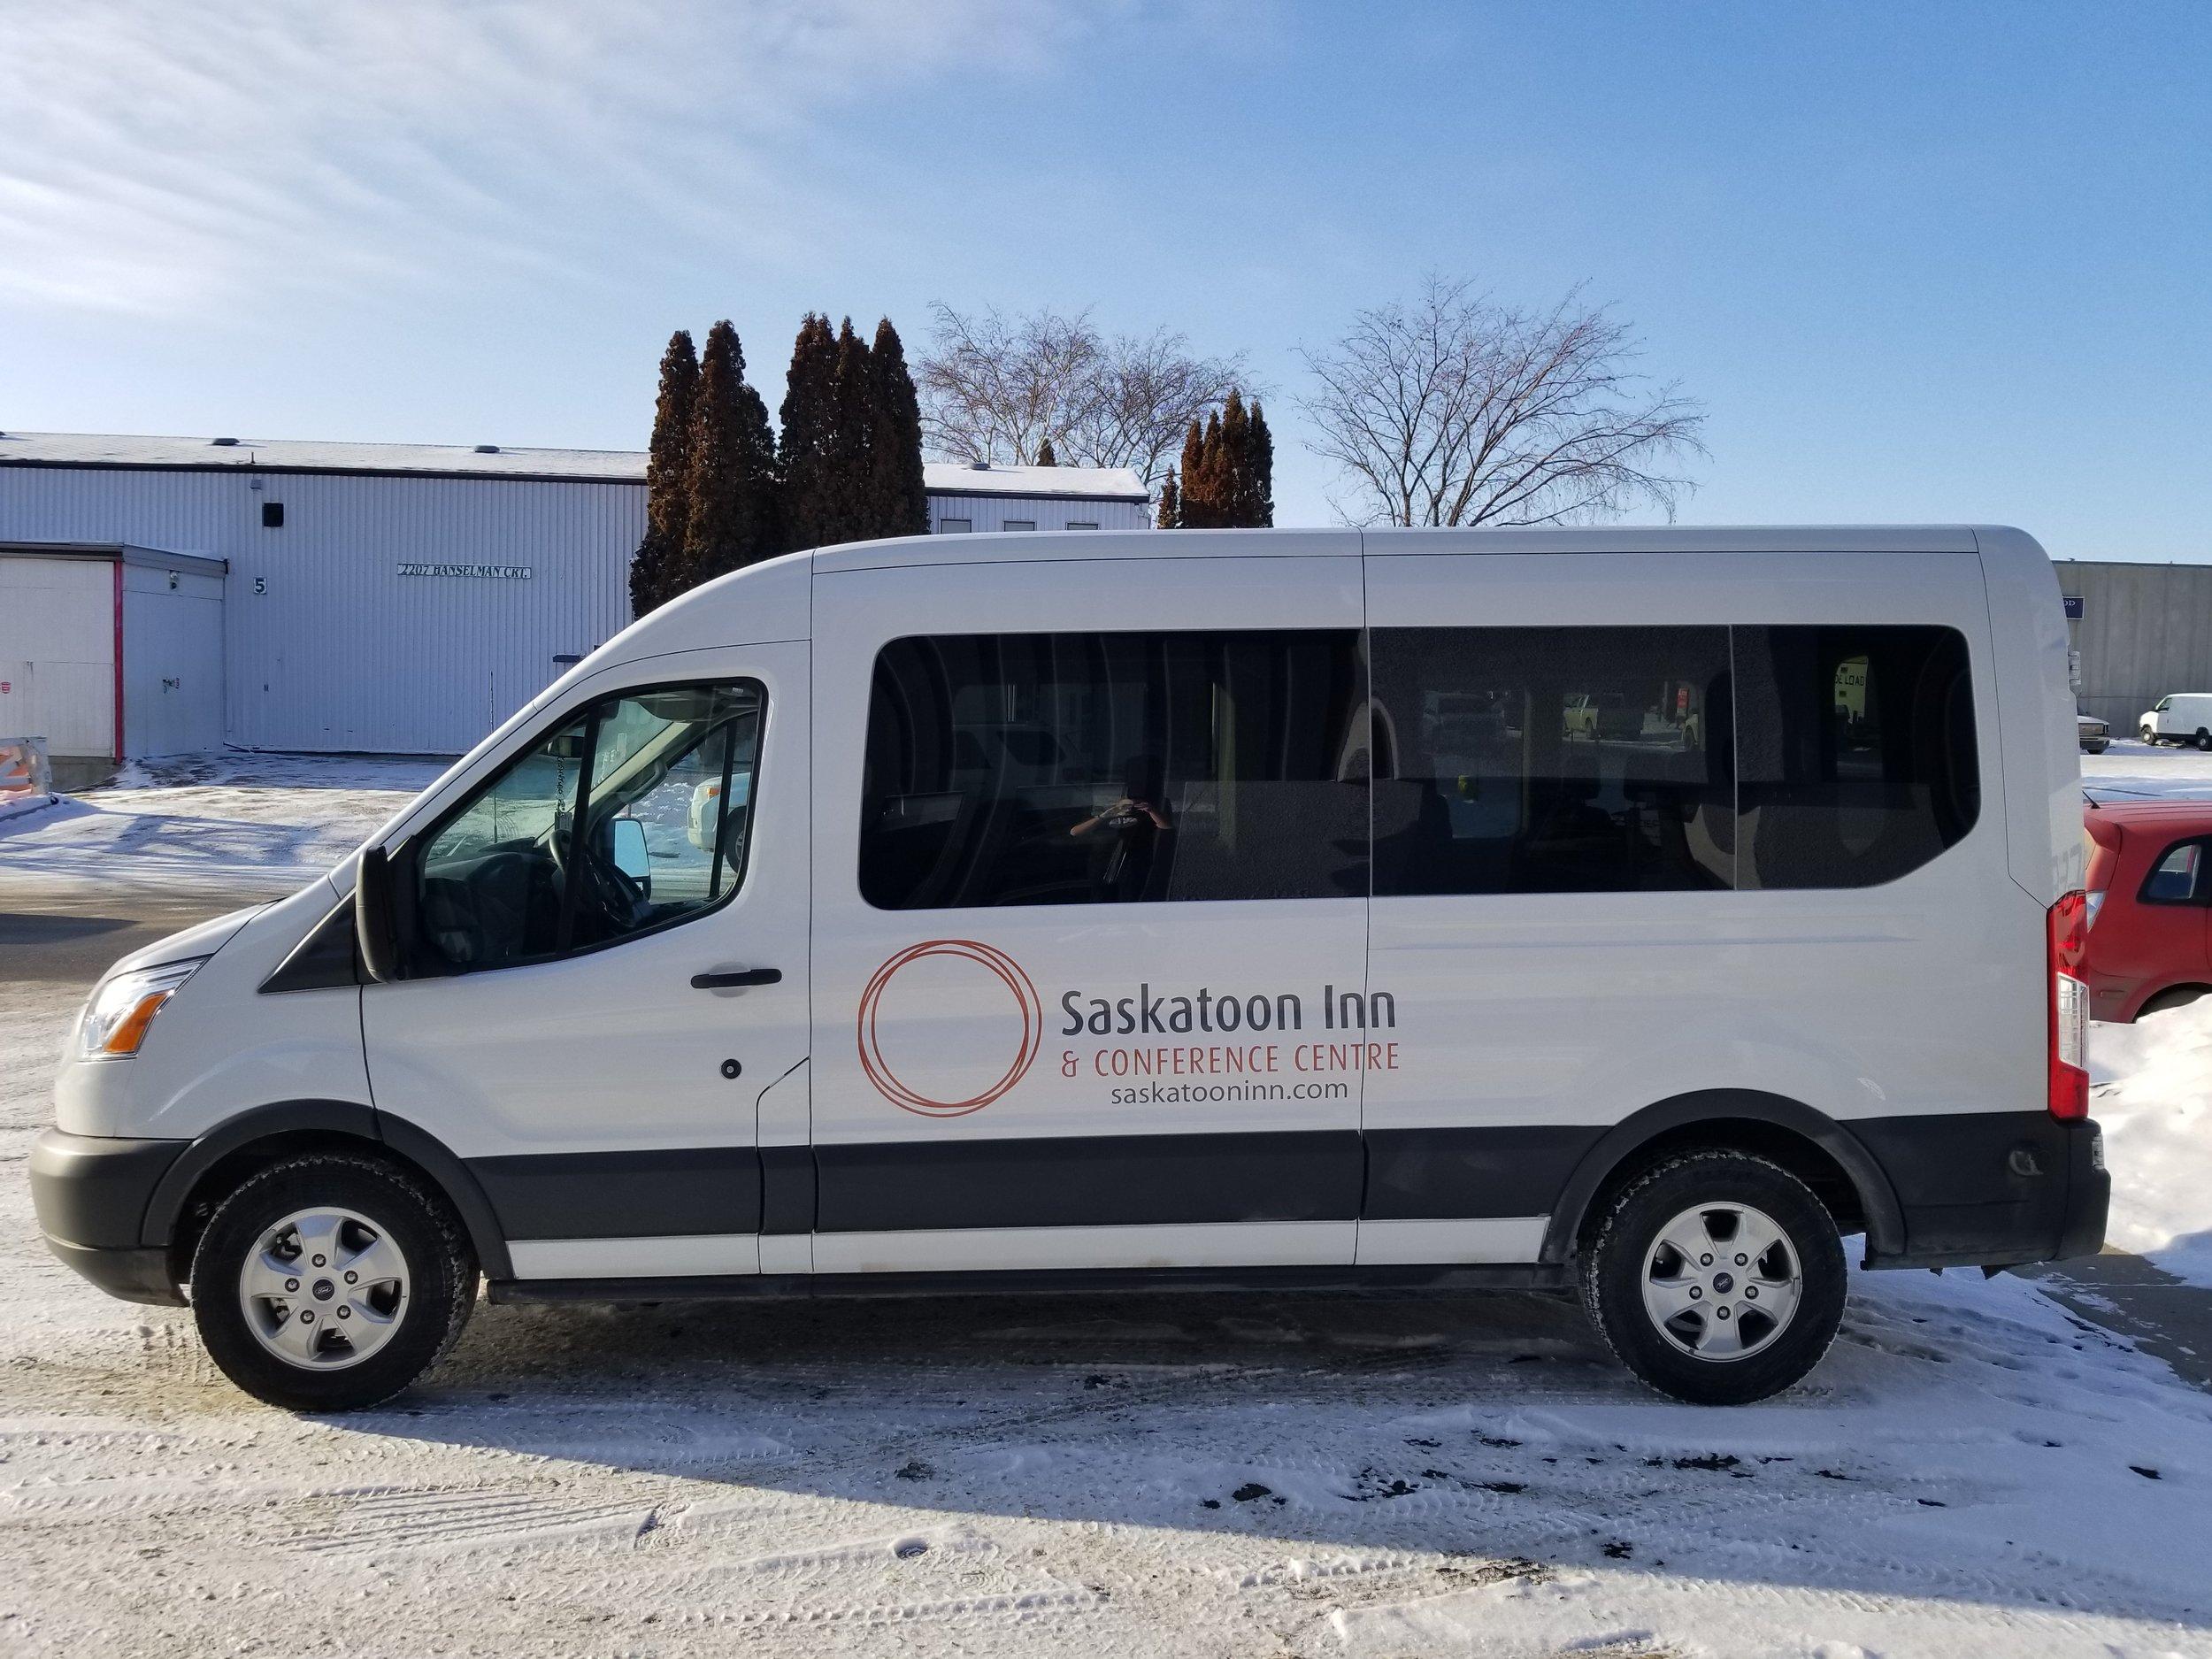 Saskatoon Inn & Conference Centre, Saskatoon